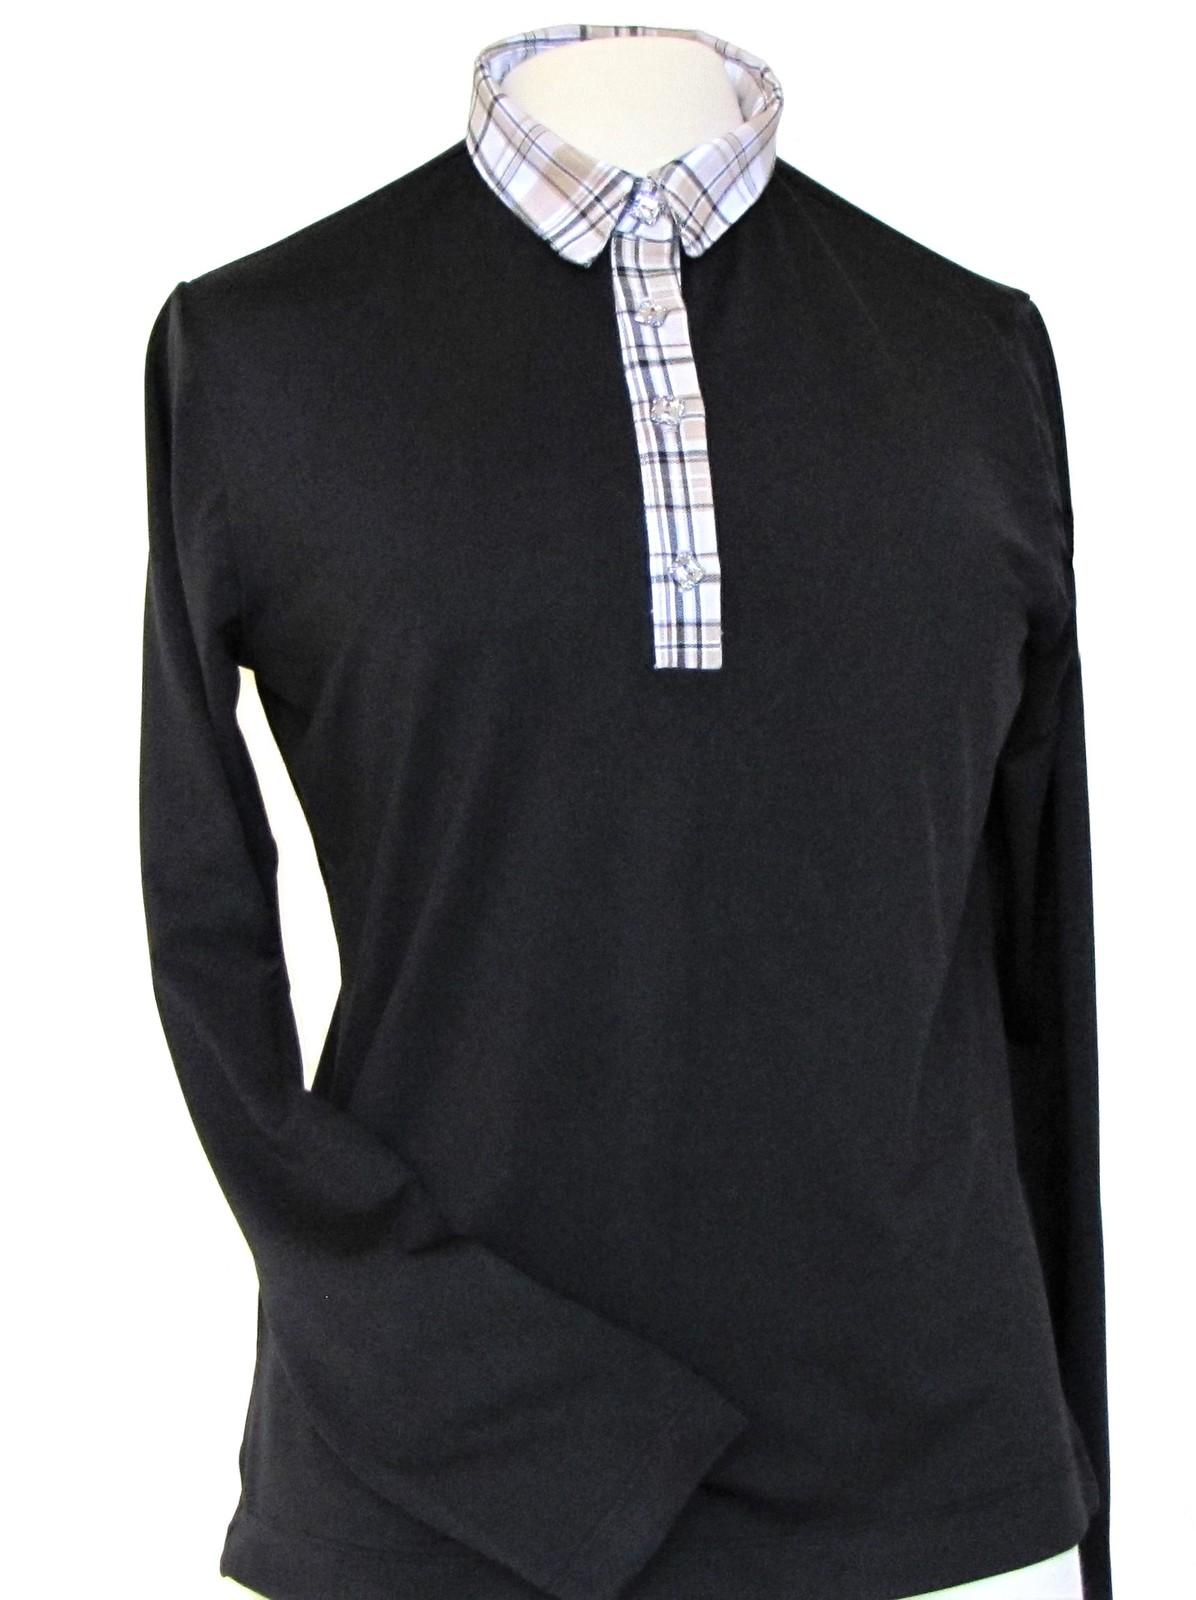 Stylish Women's Golf & Resort Black Long Sleeve Collar Top, Swarovski Buttons